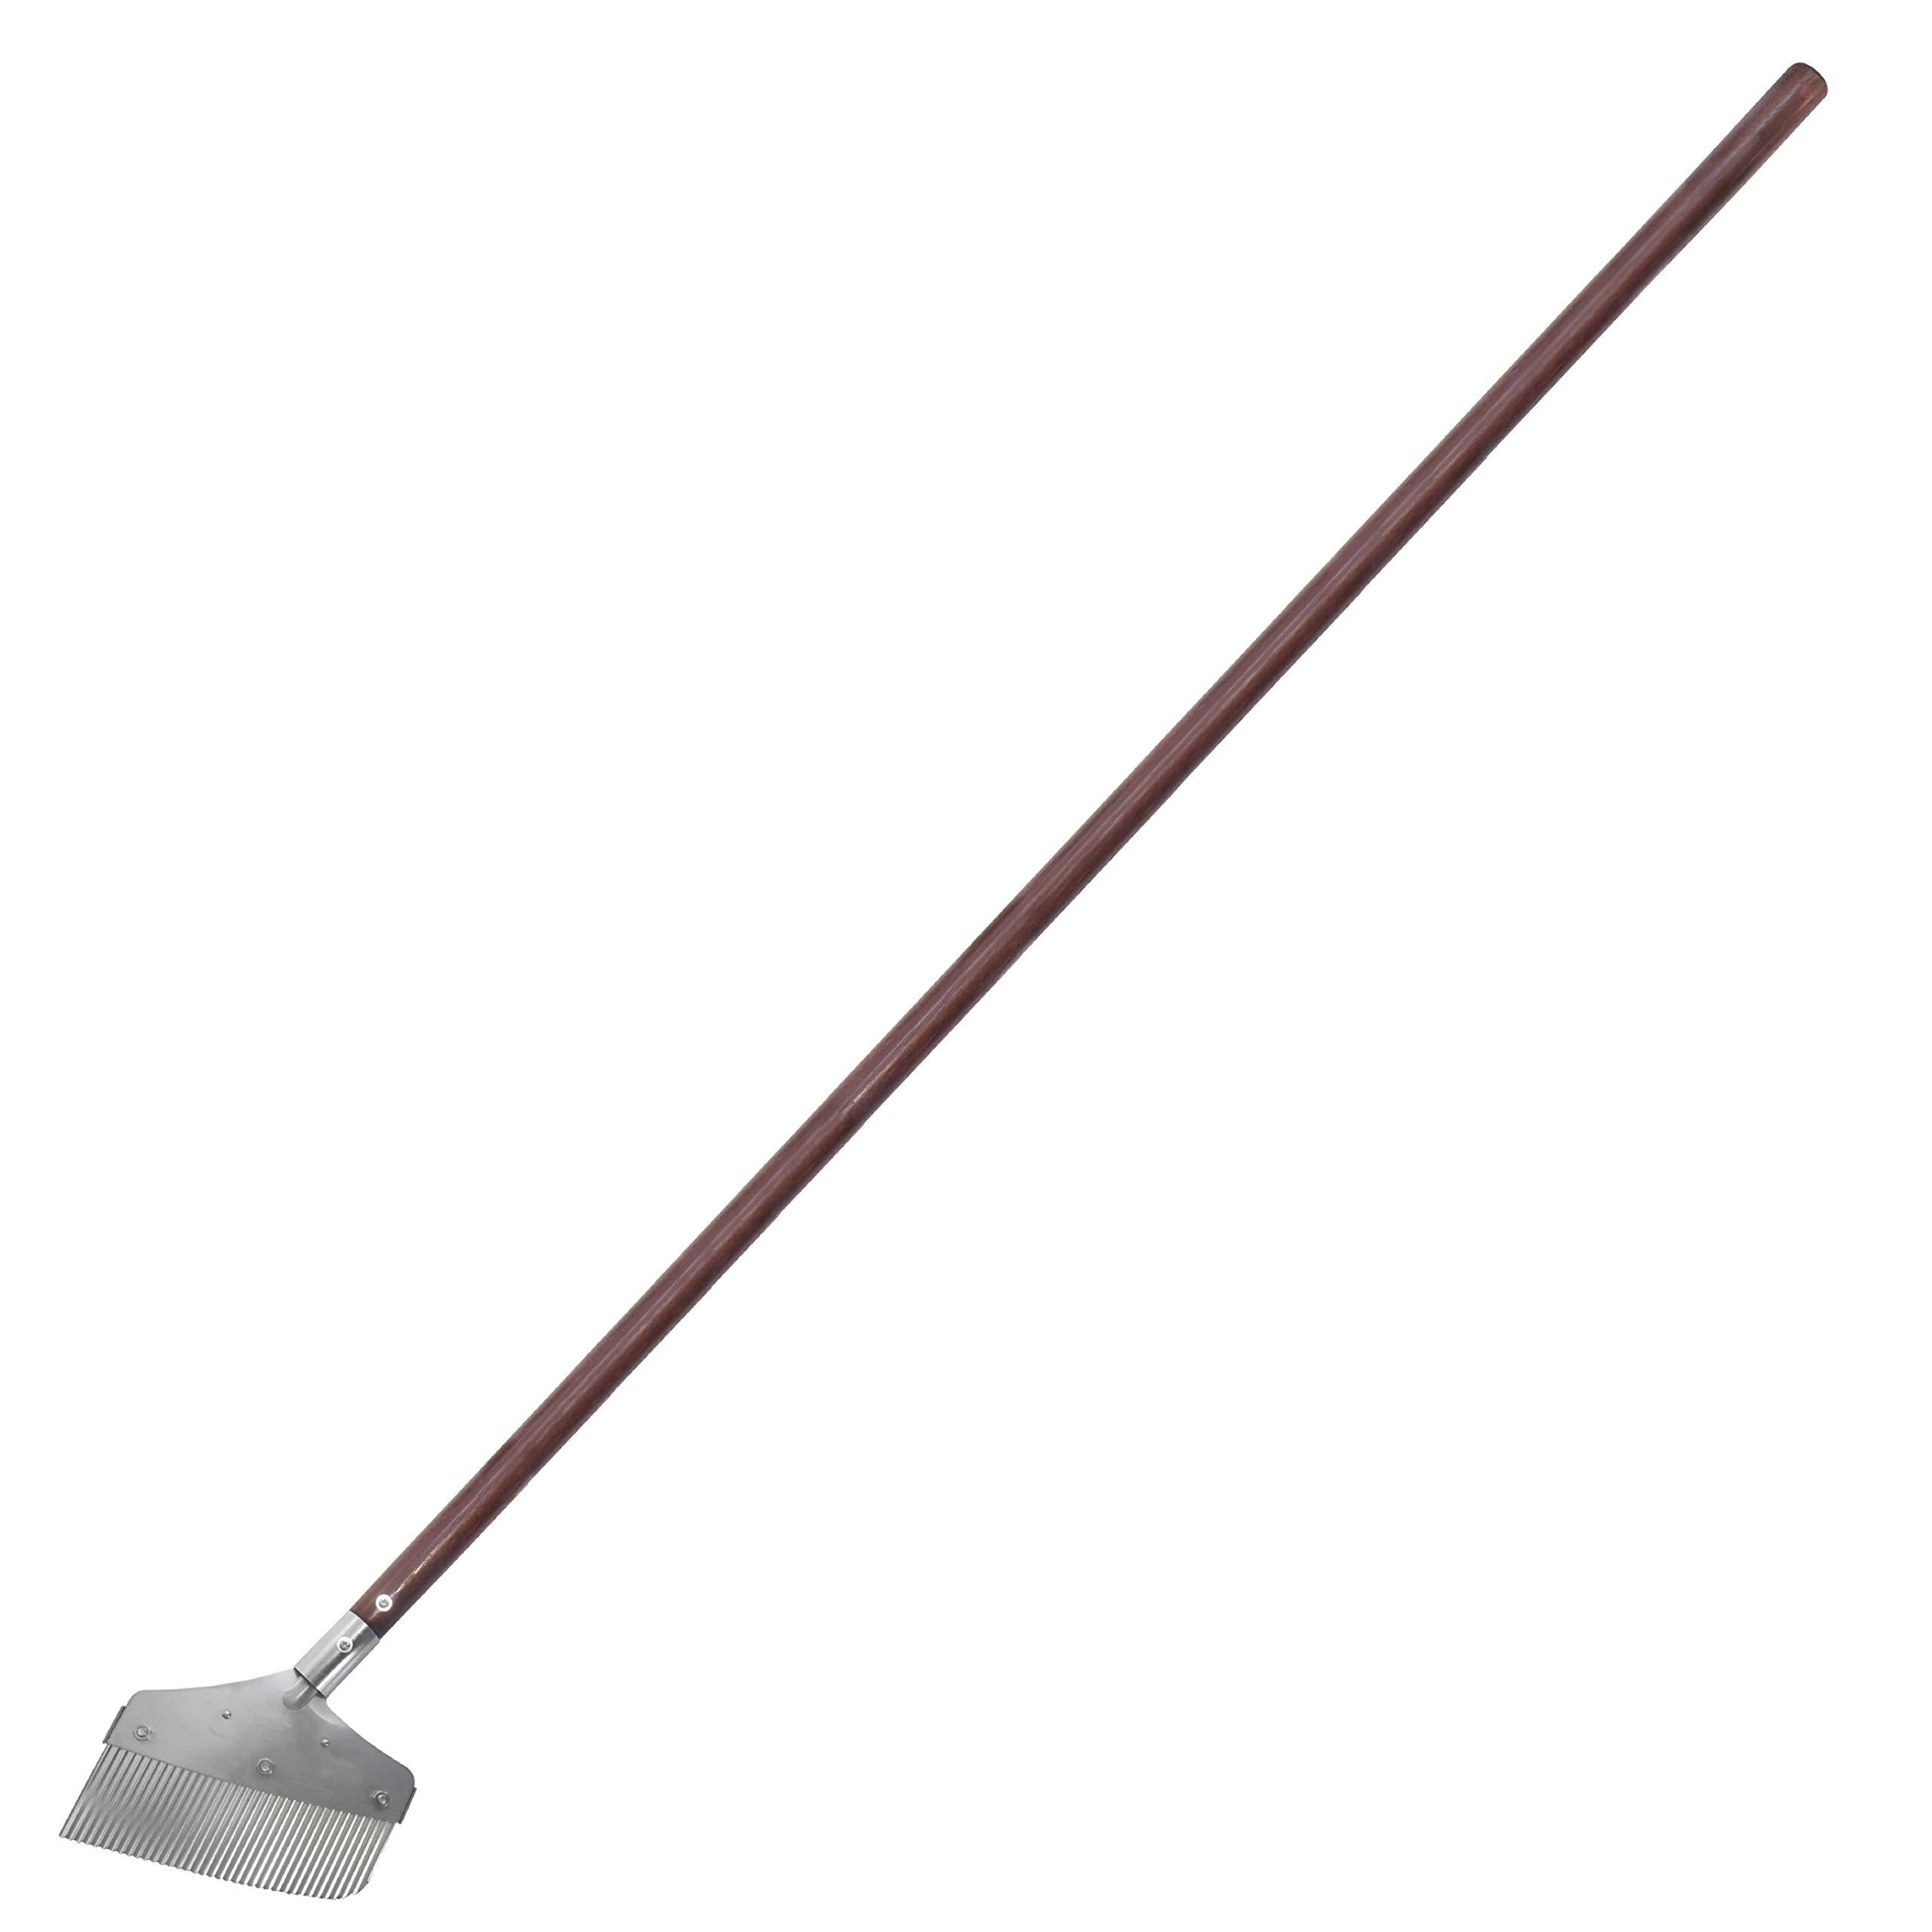 Nisaku NJP2520 Long Sidewalk and Garden Weeder and Sweeper, Authentic Tomita (Est. 1960) Japanese Stainless Steel, Blade Width-7.25'', Polished 51'' Wood Handle